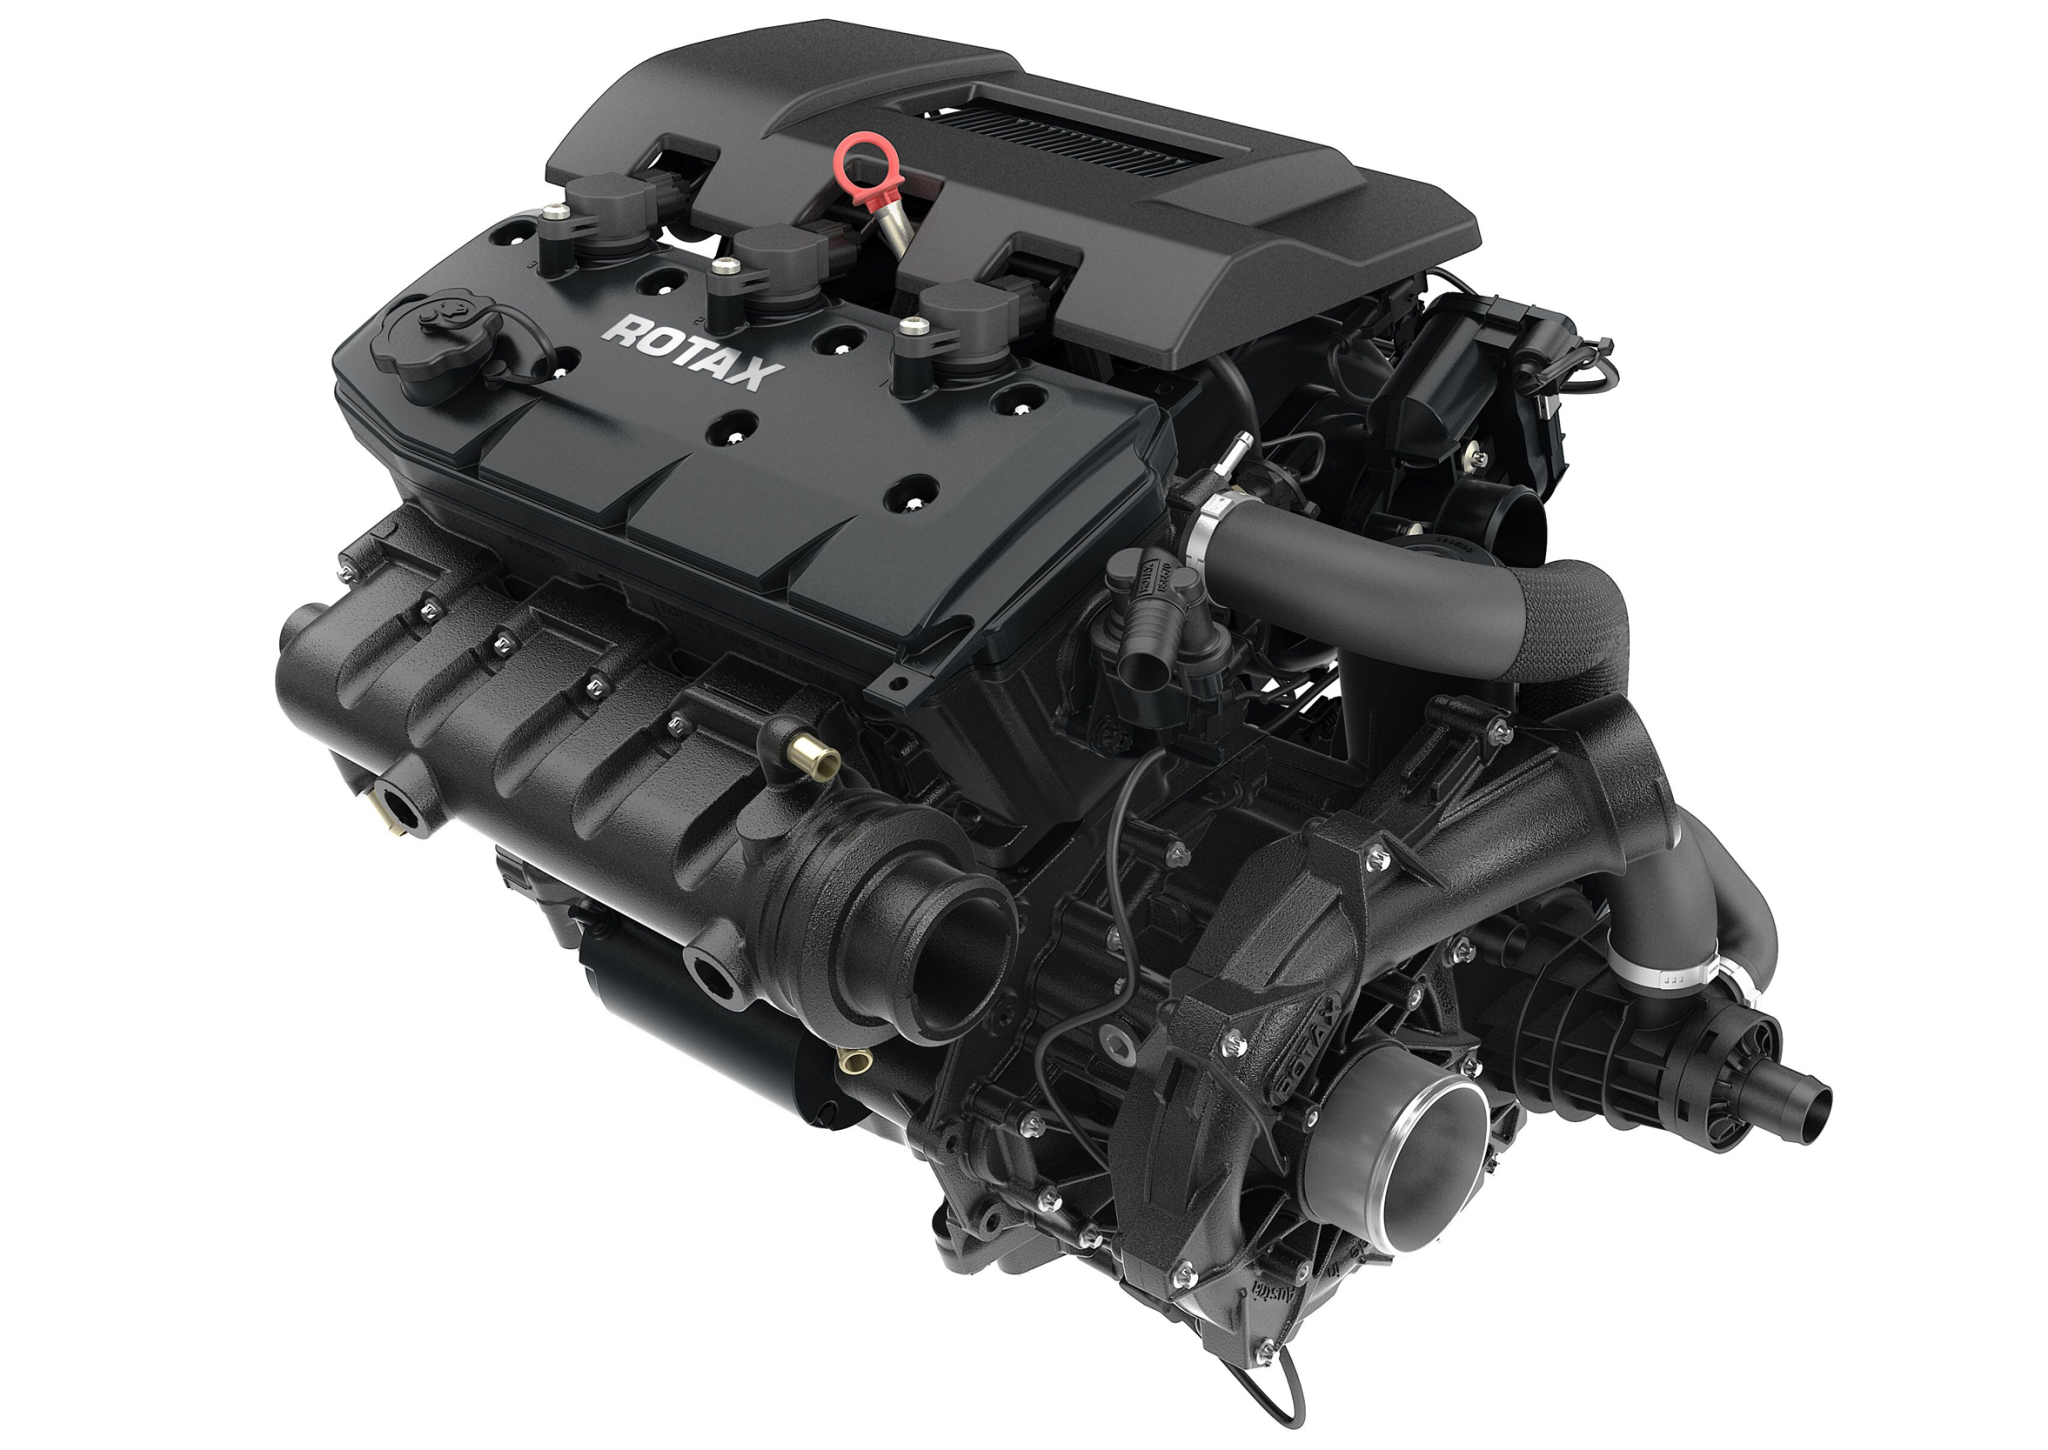 Motor Rotax 1630 ACE